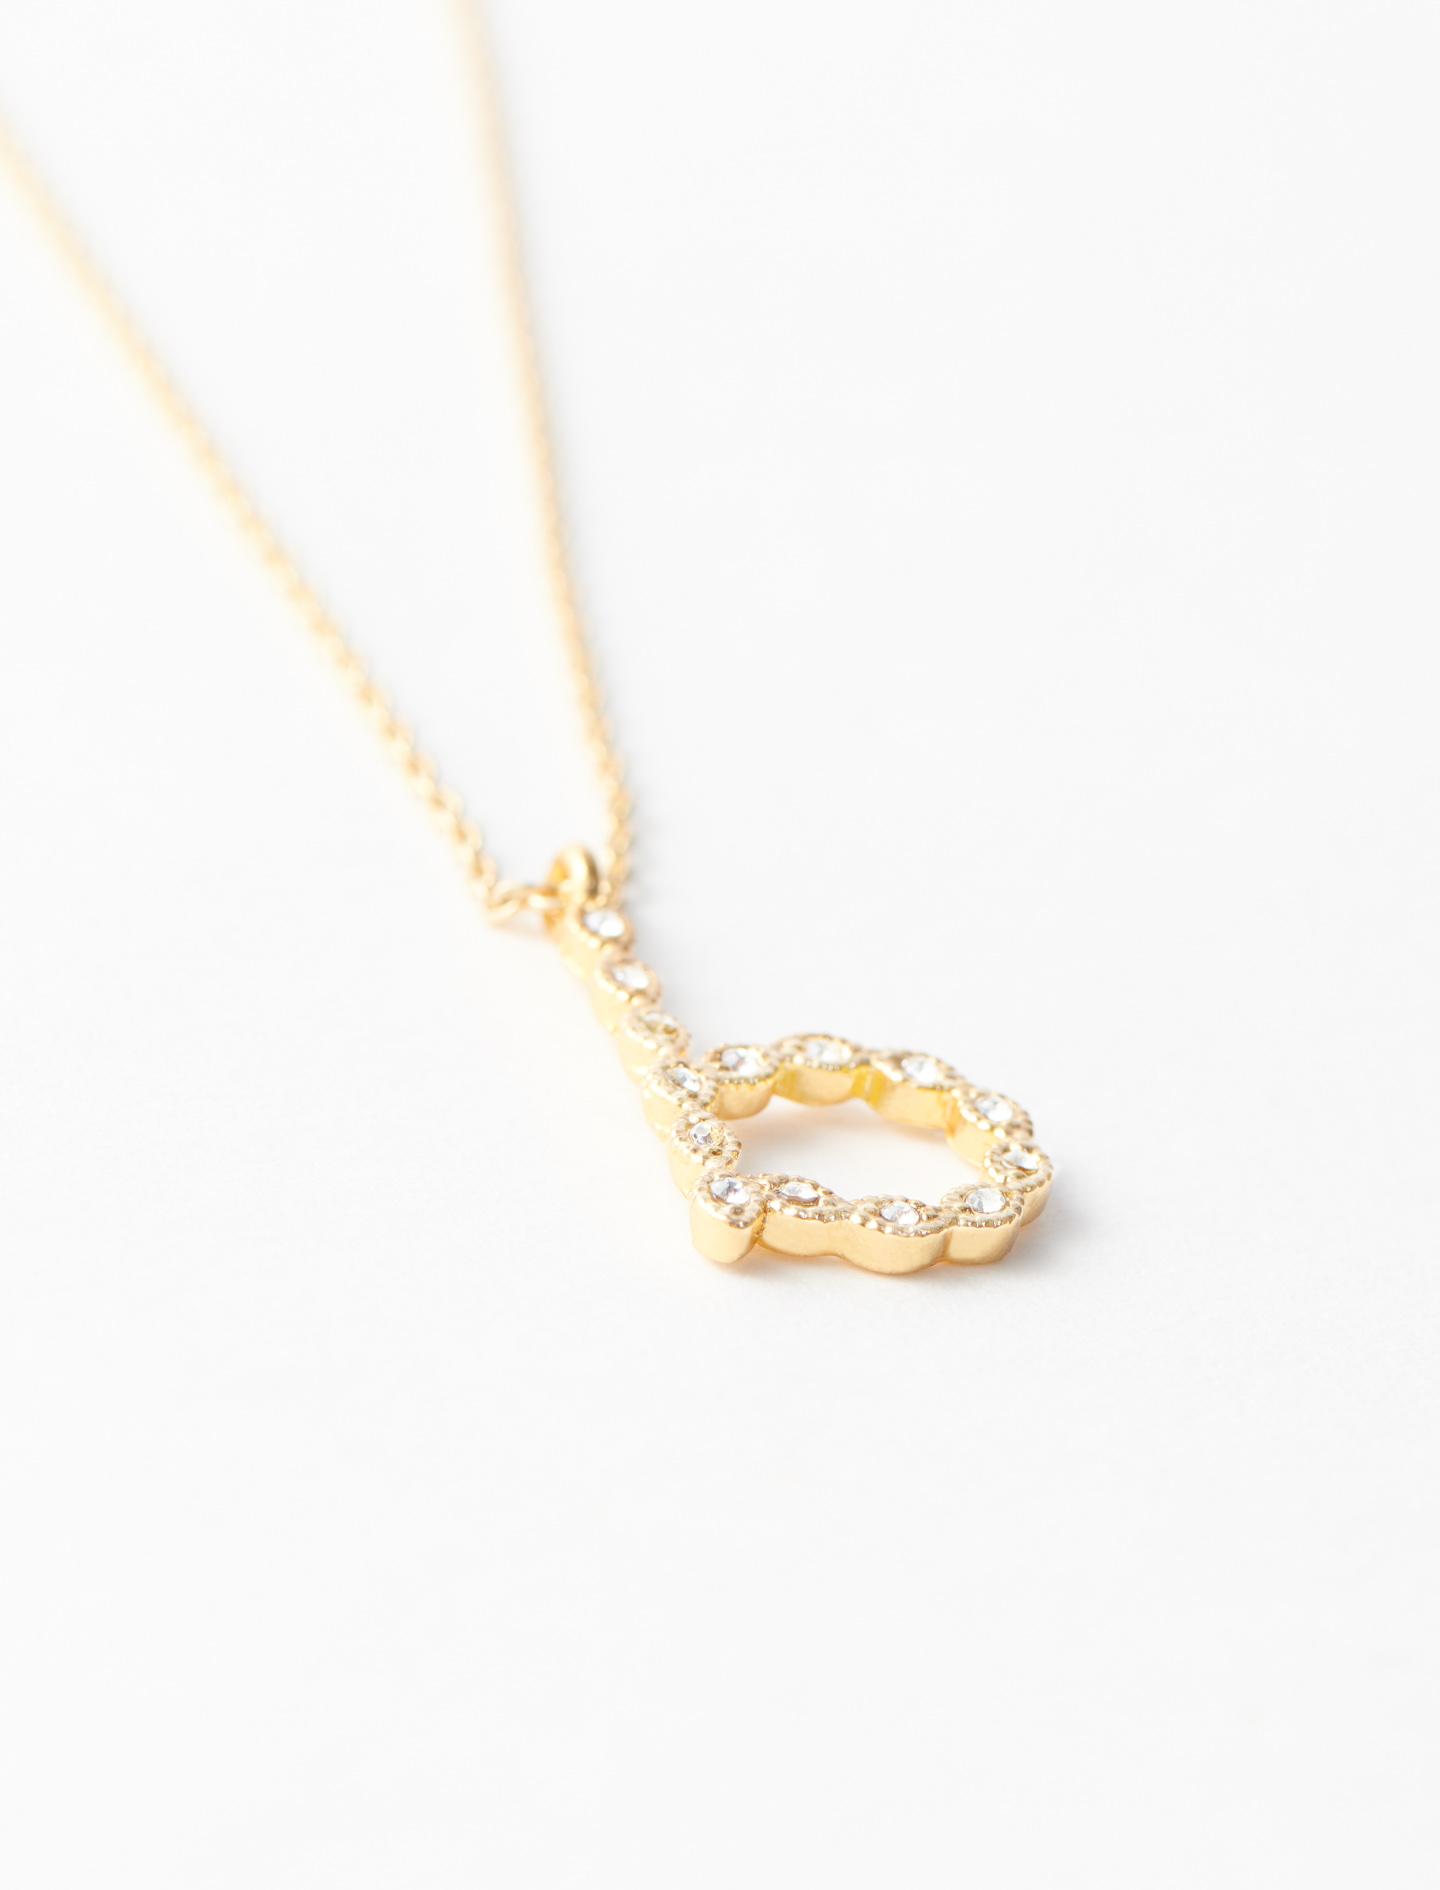 Rhinestone B necklace - Gold